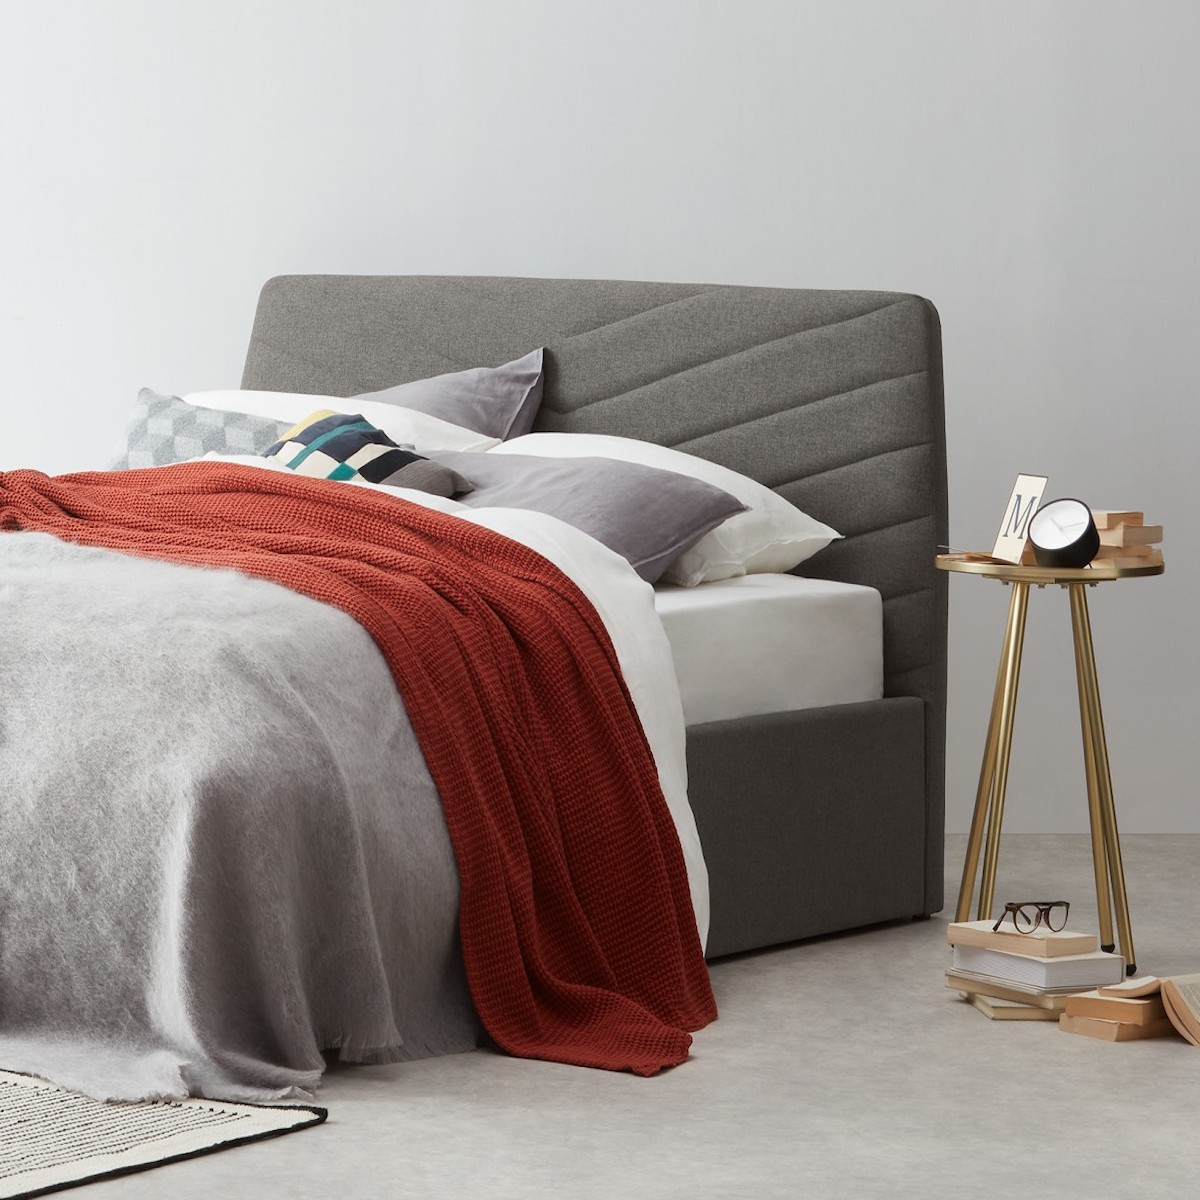 lit king size gris moderne sommier rangement plaid rouge table laiton ronde